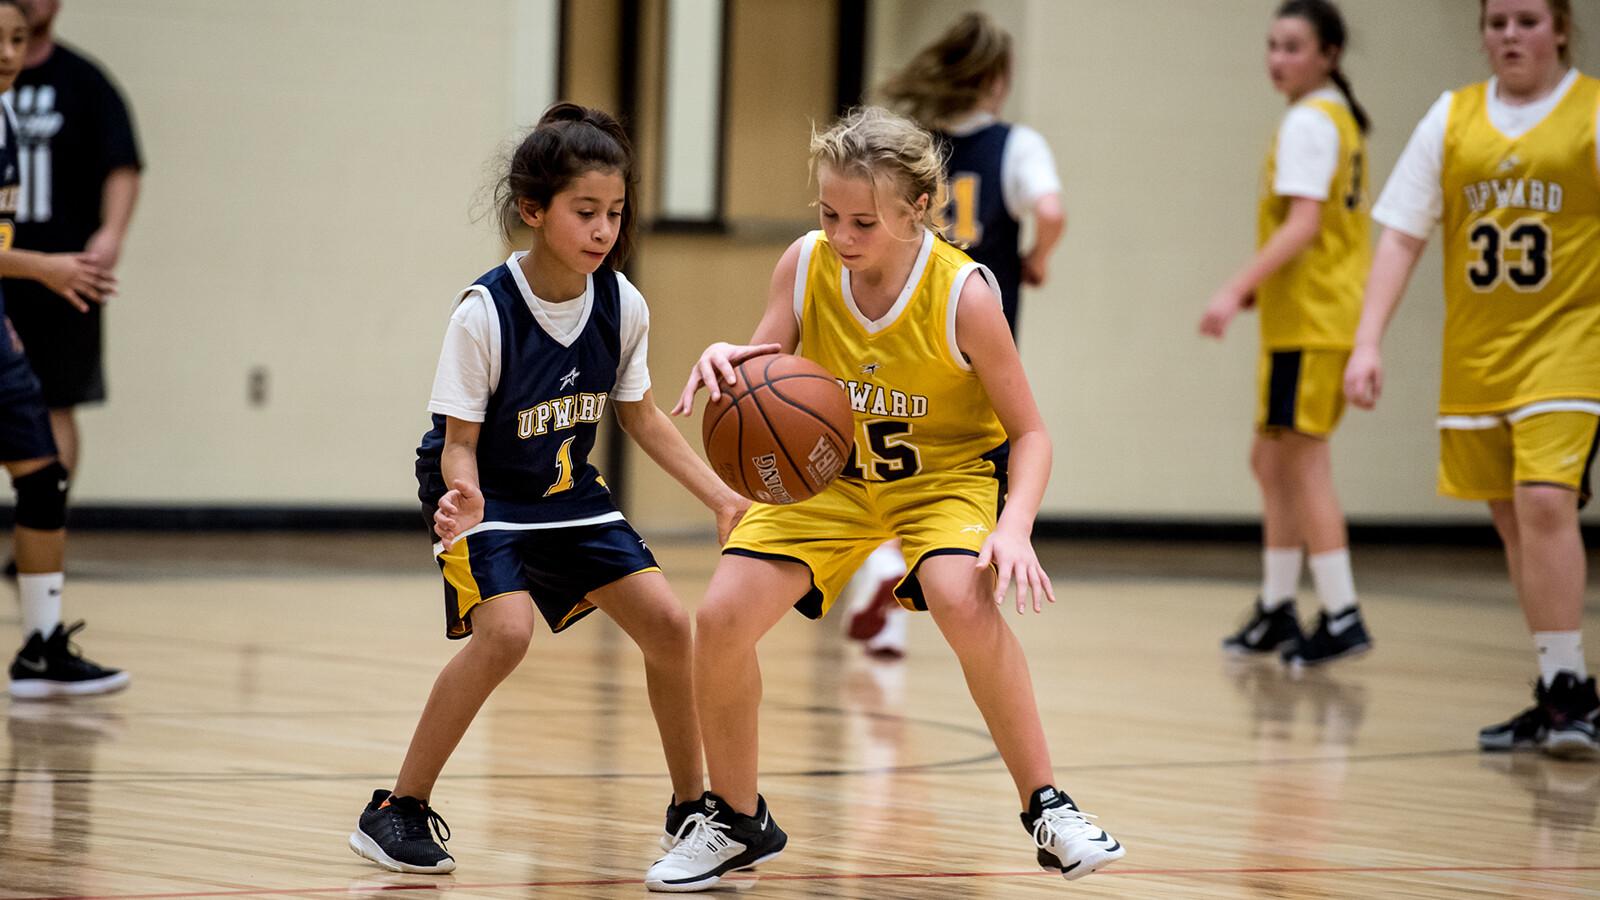 Upward Basketball Cheer First Baptist Forney